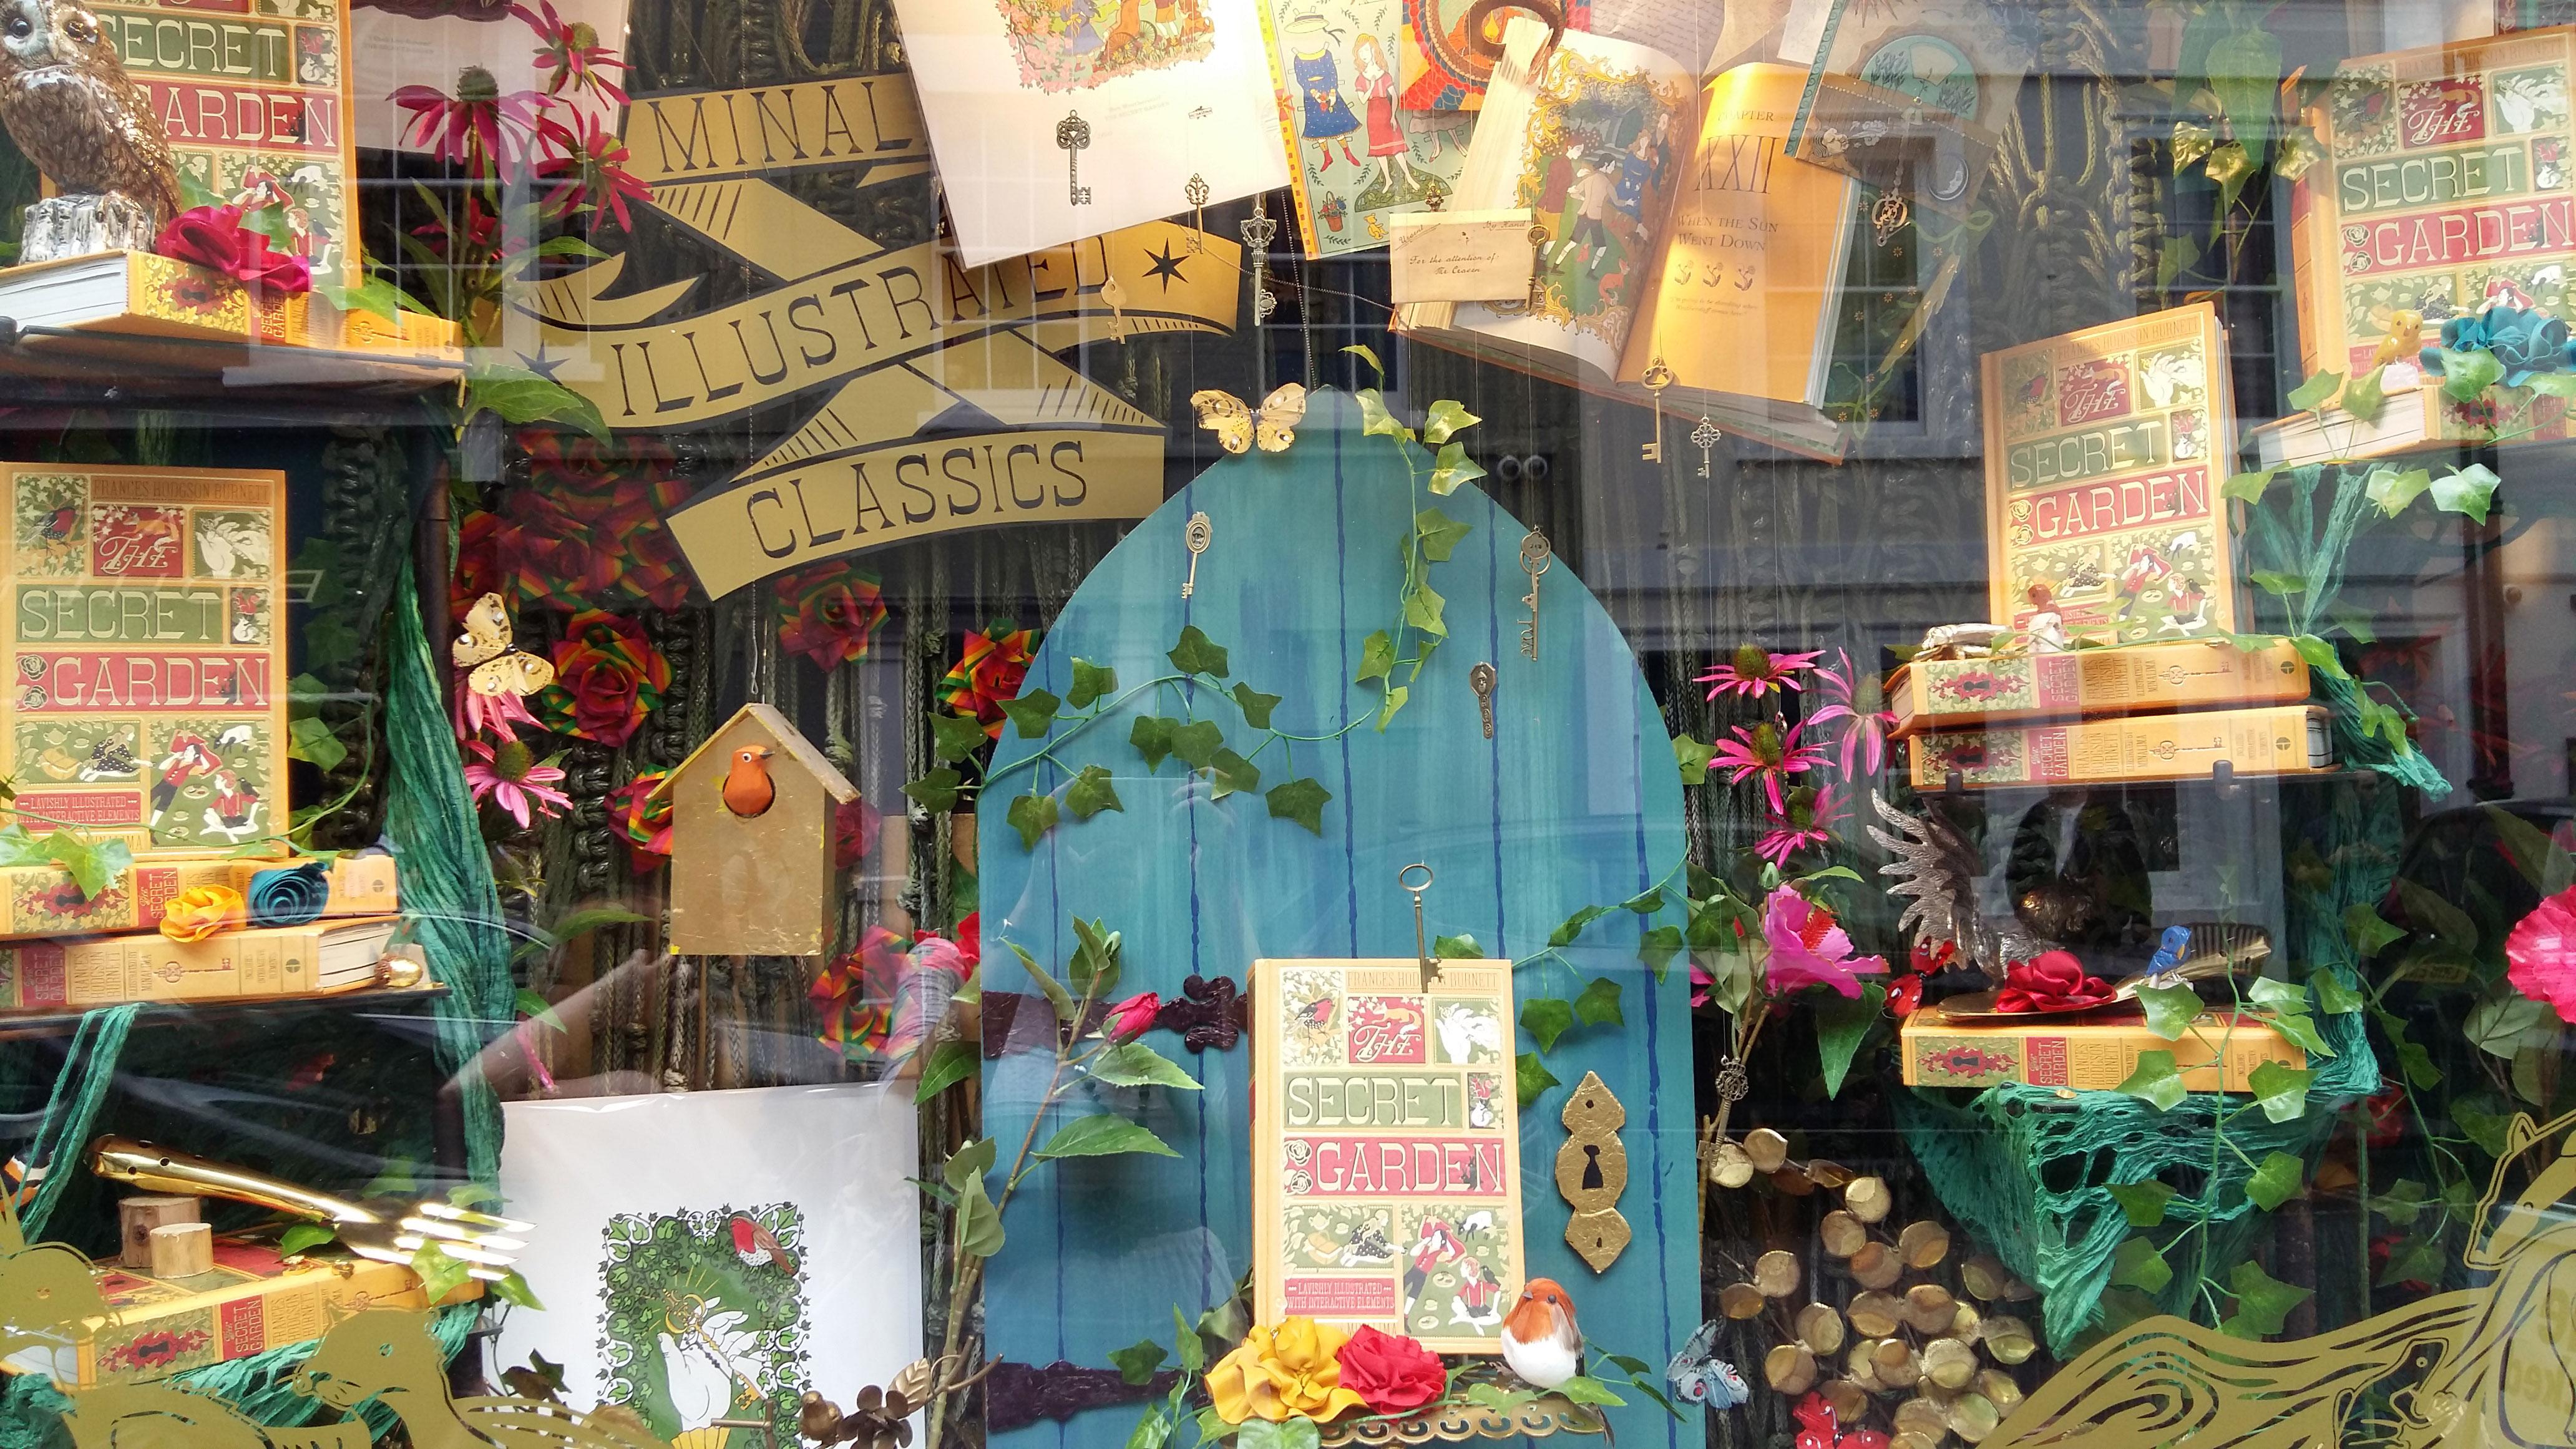 "House of MinaLima ""The Secret Garden"" window display"